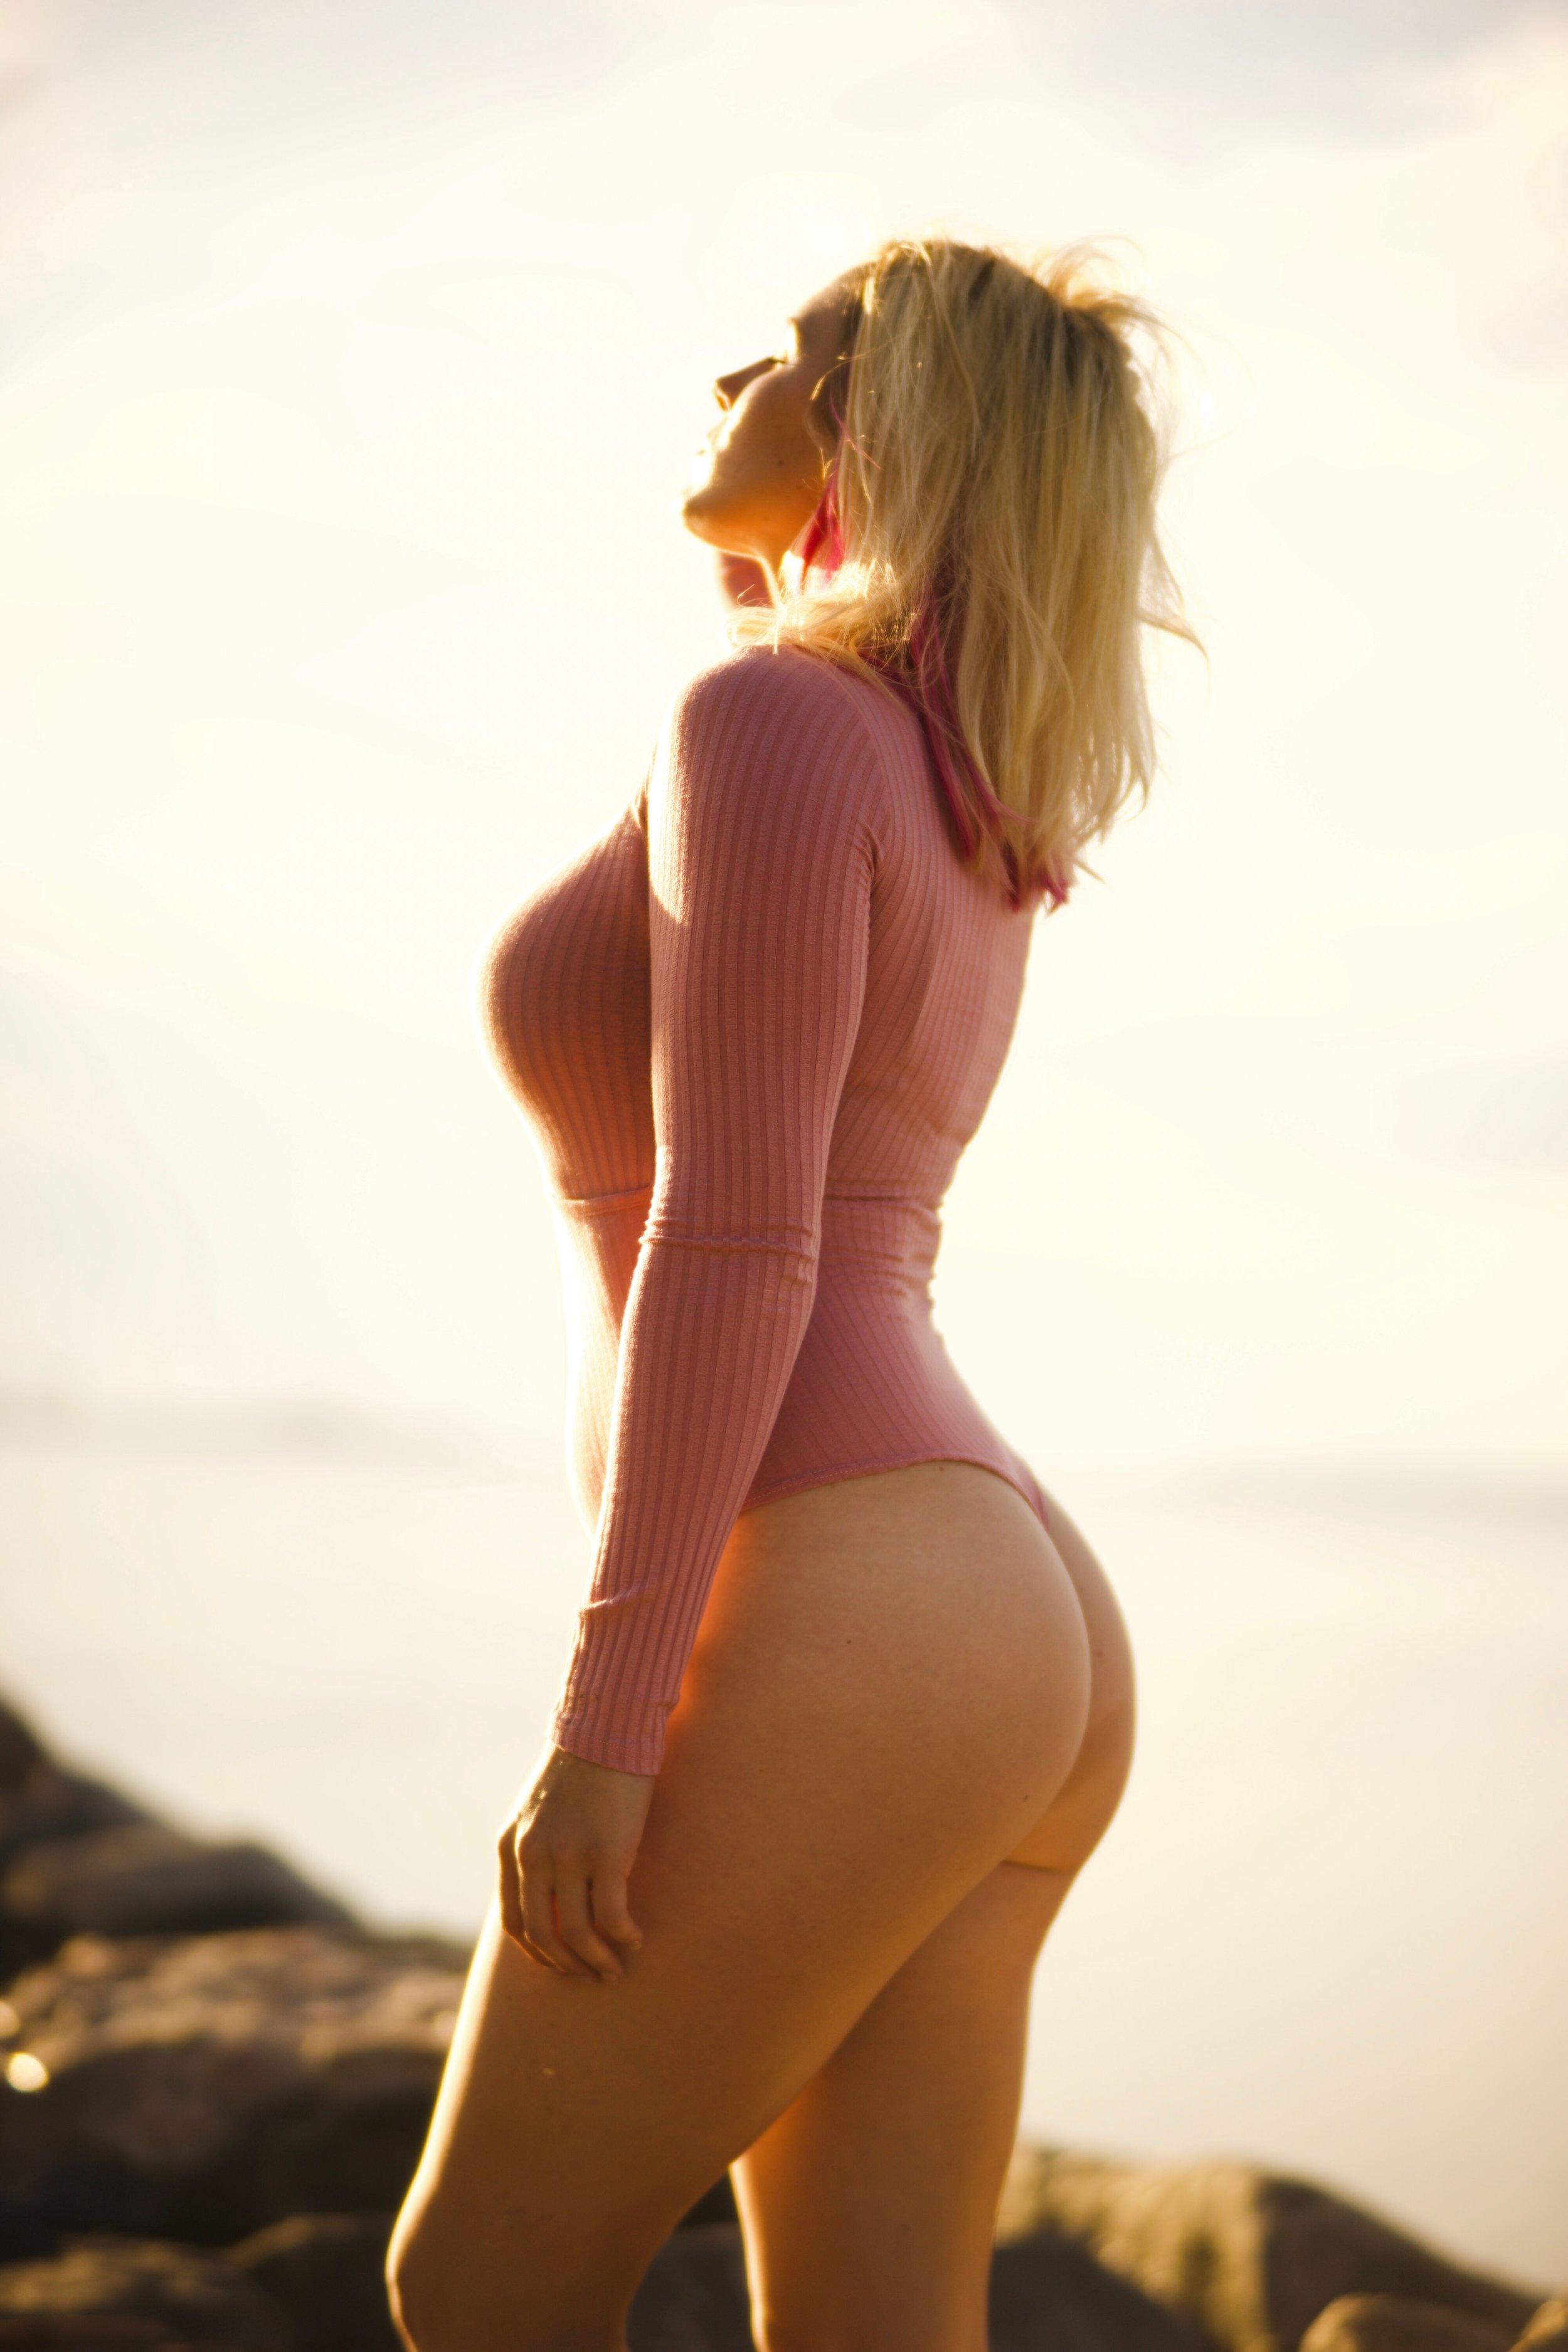 bodysuit images